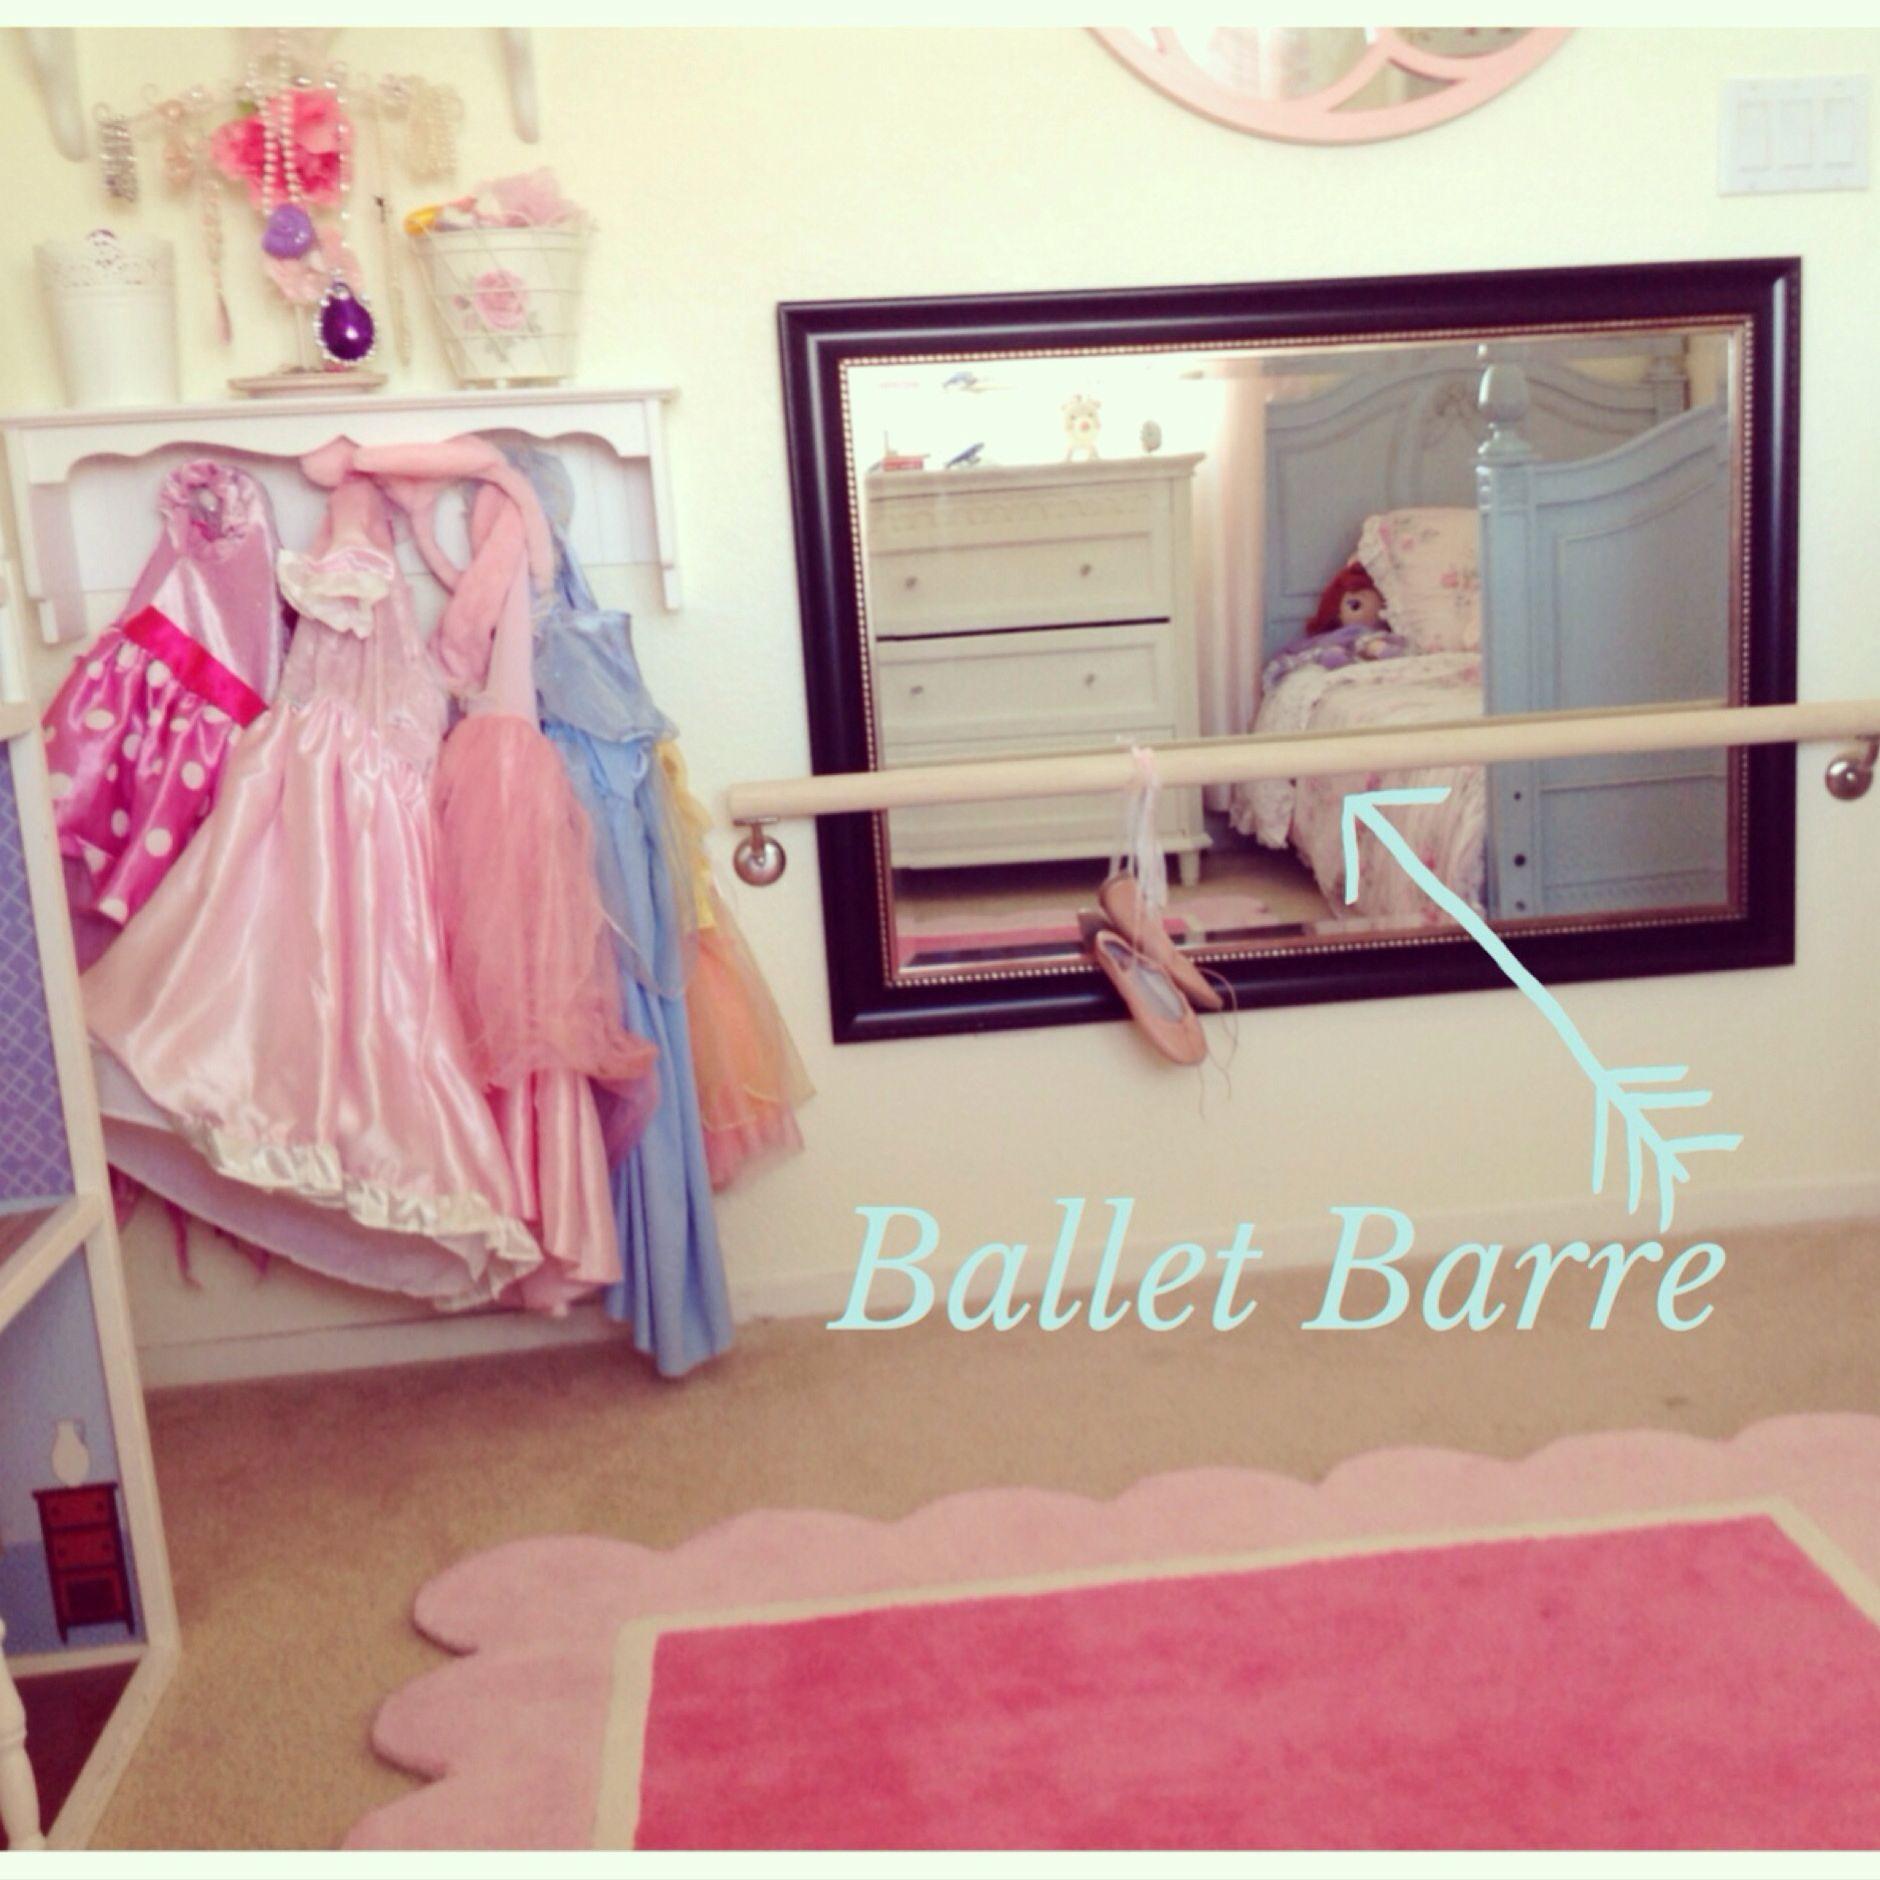 Ava's diy ballet barre using a wood dowel & stair banister brackets